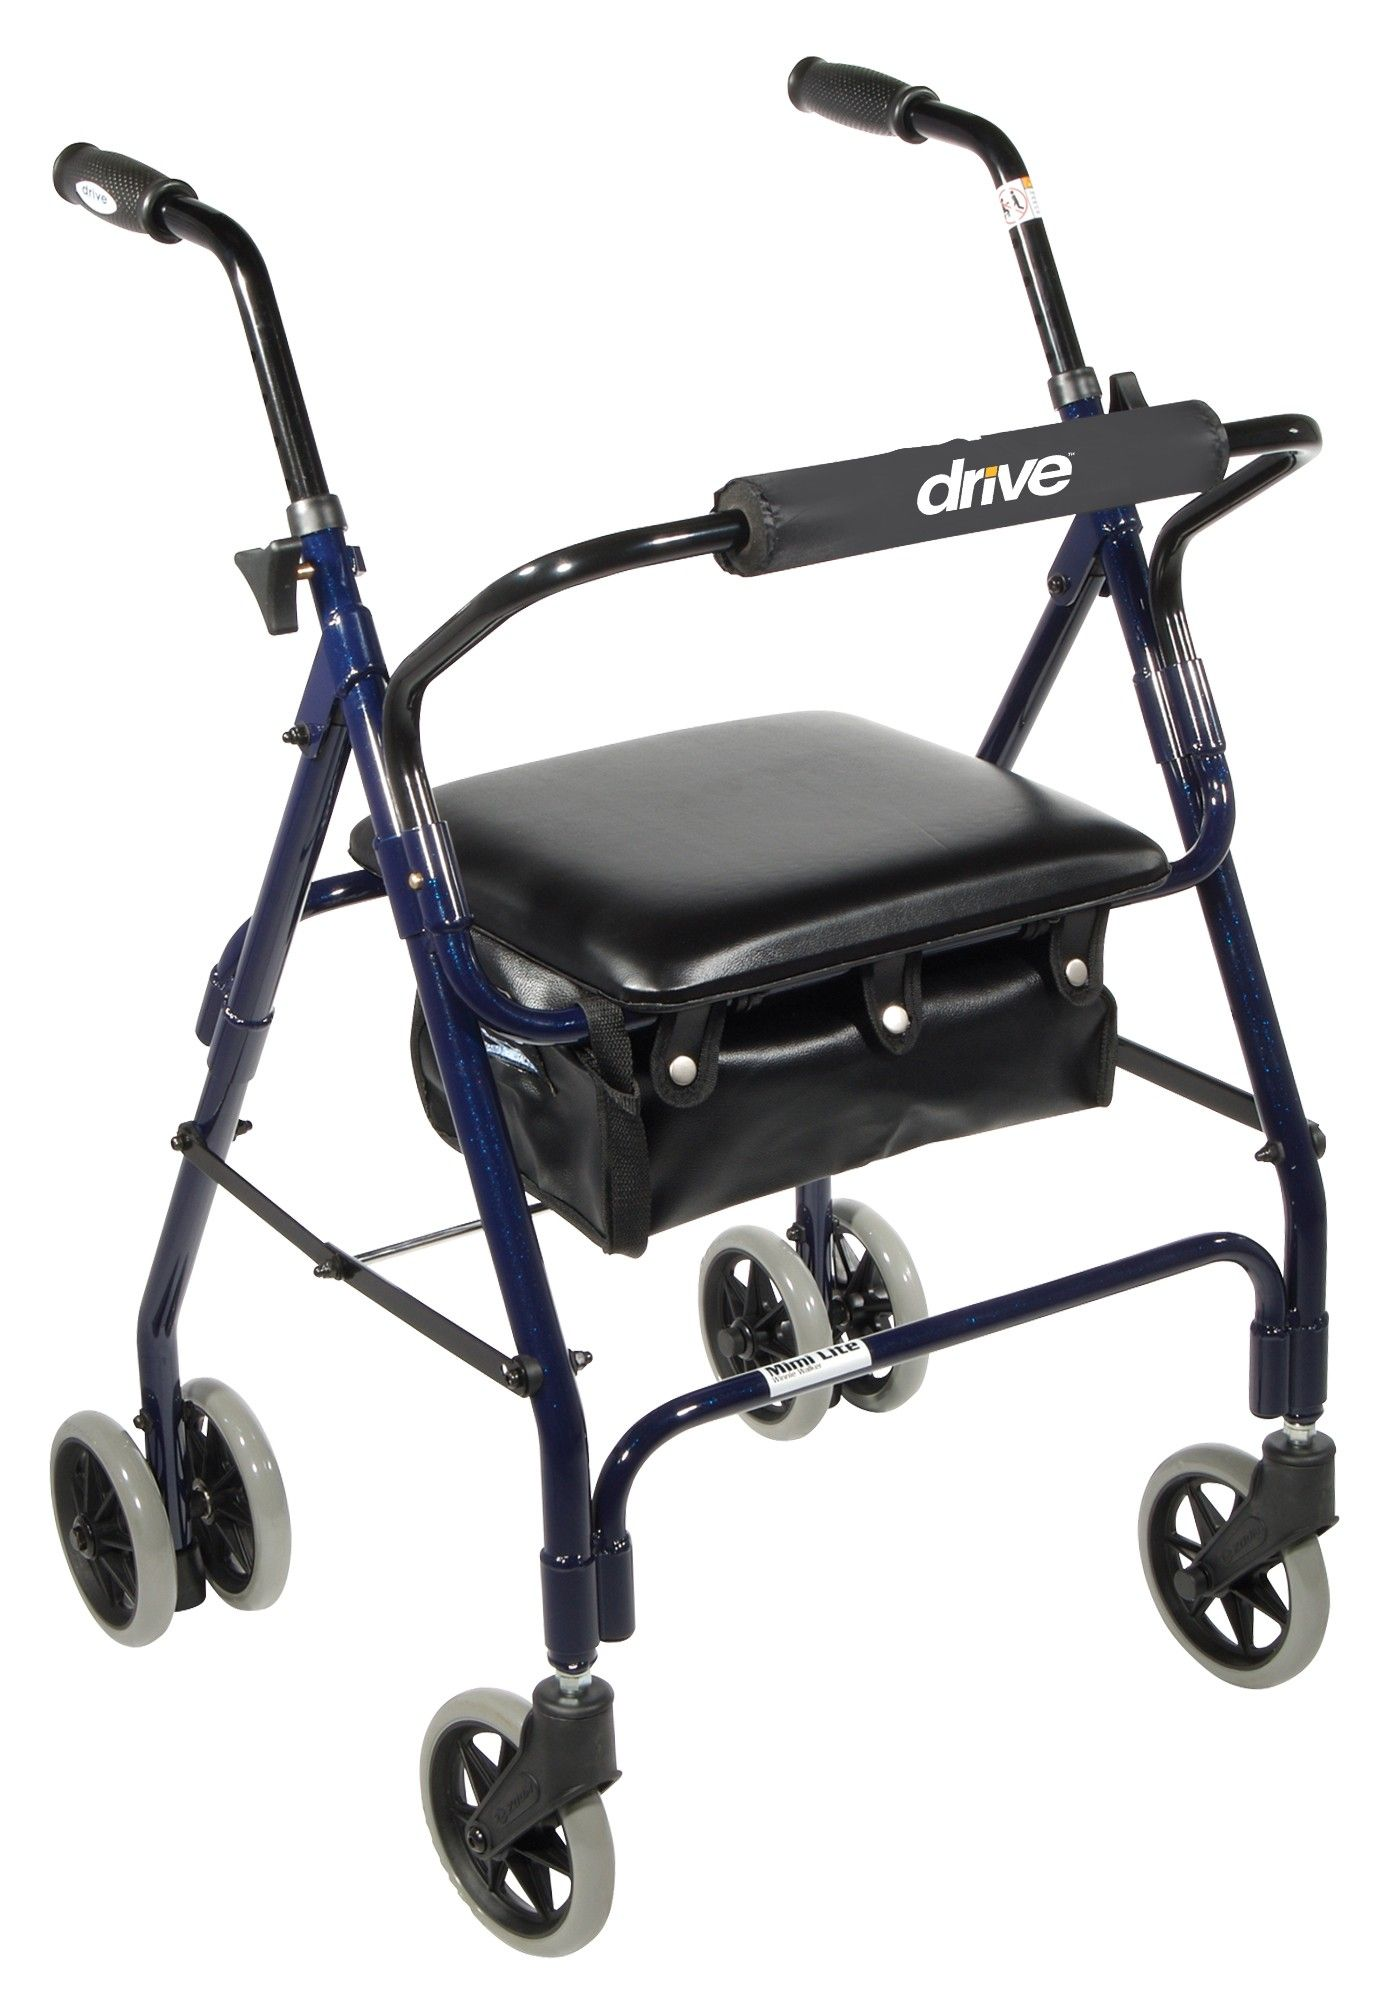 walgreens transport chair dimensions